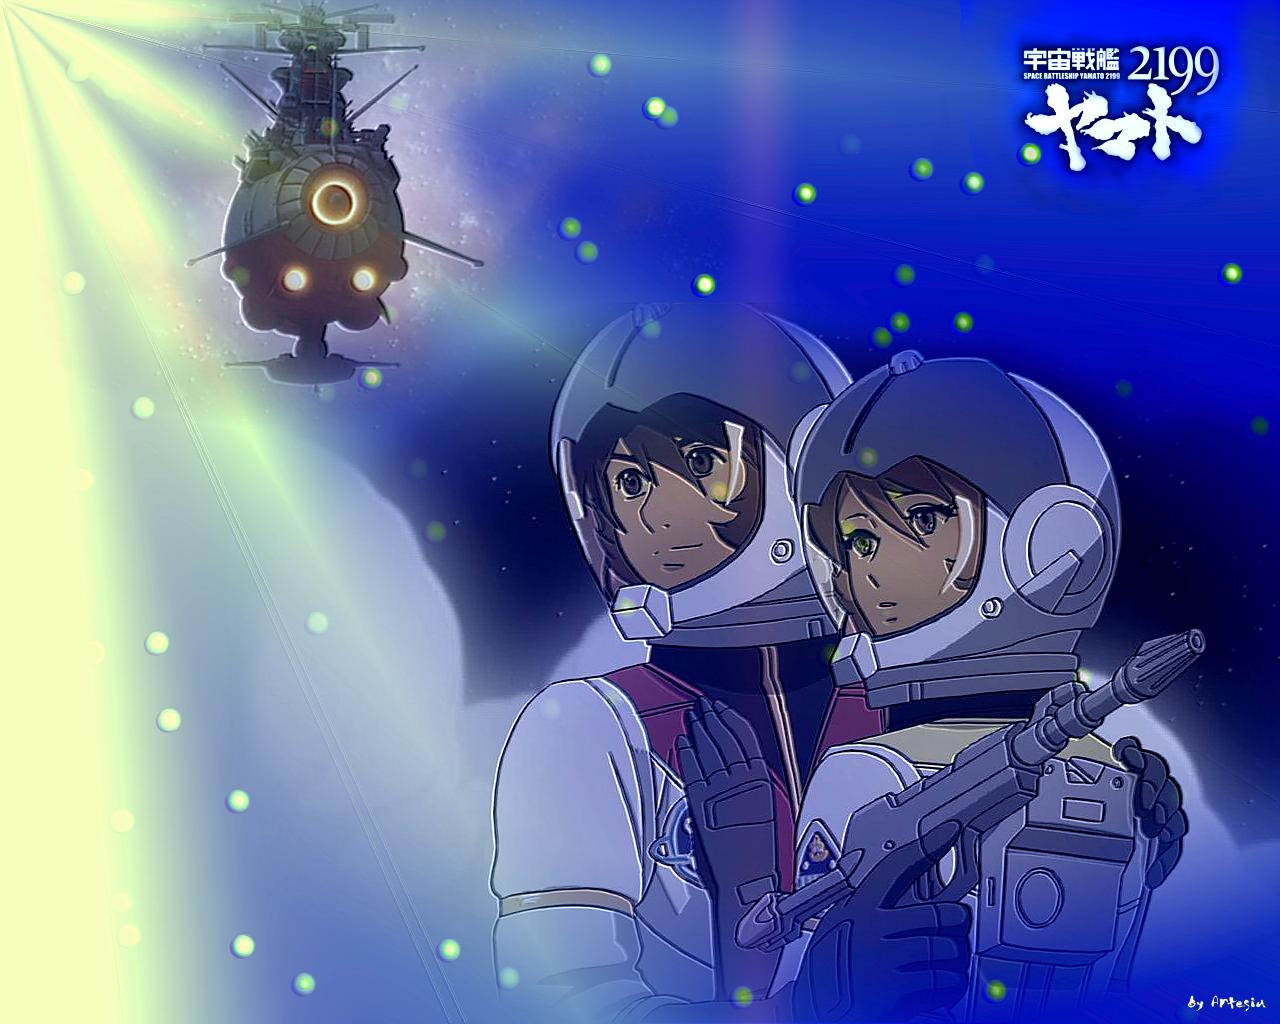 Uchuu Senkan Yamato 2199 Space Battleship Yamato Wallpaper